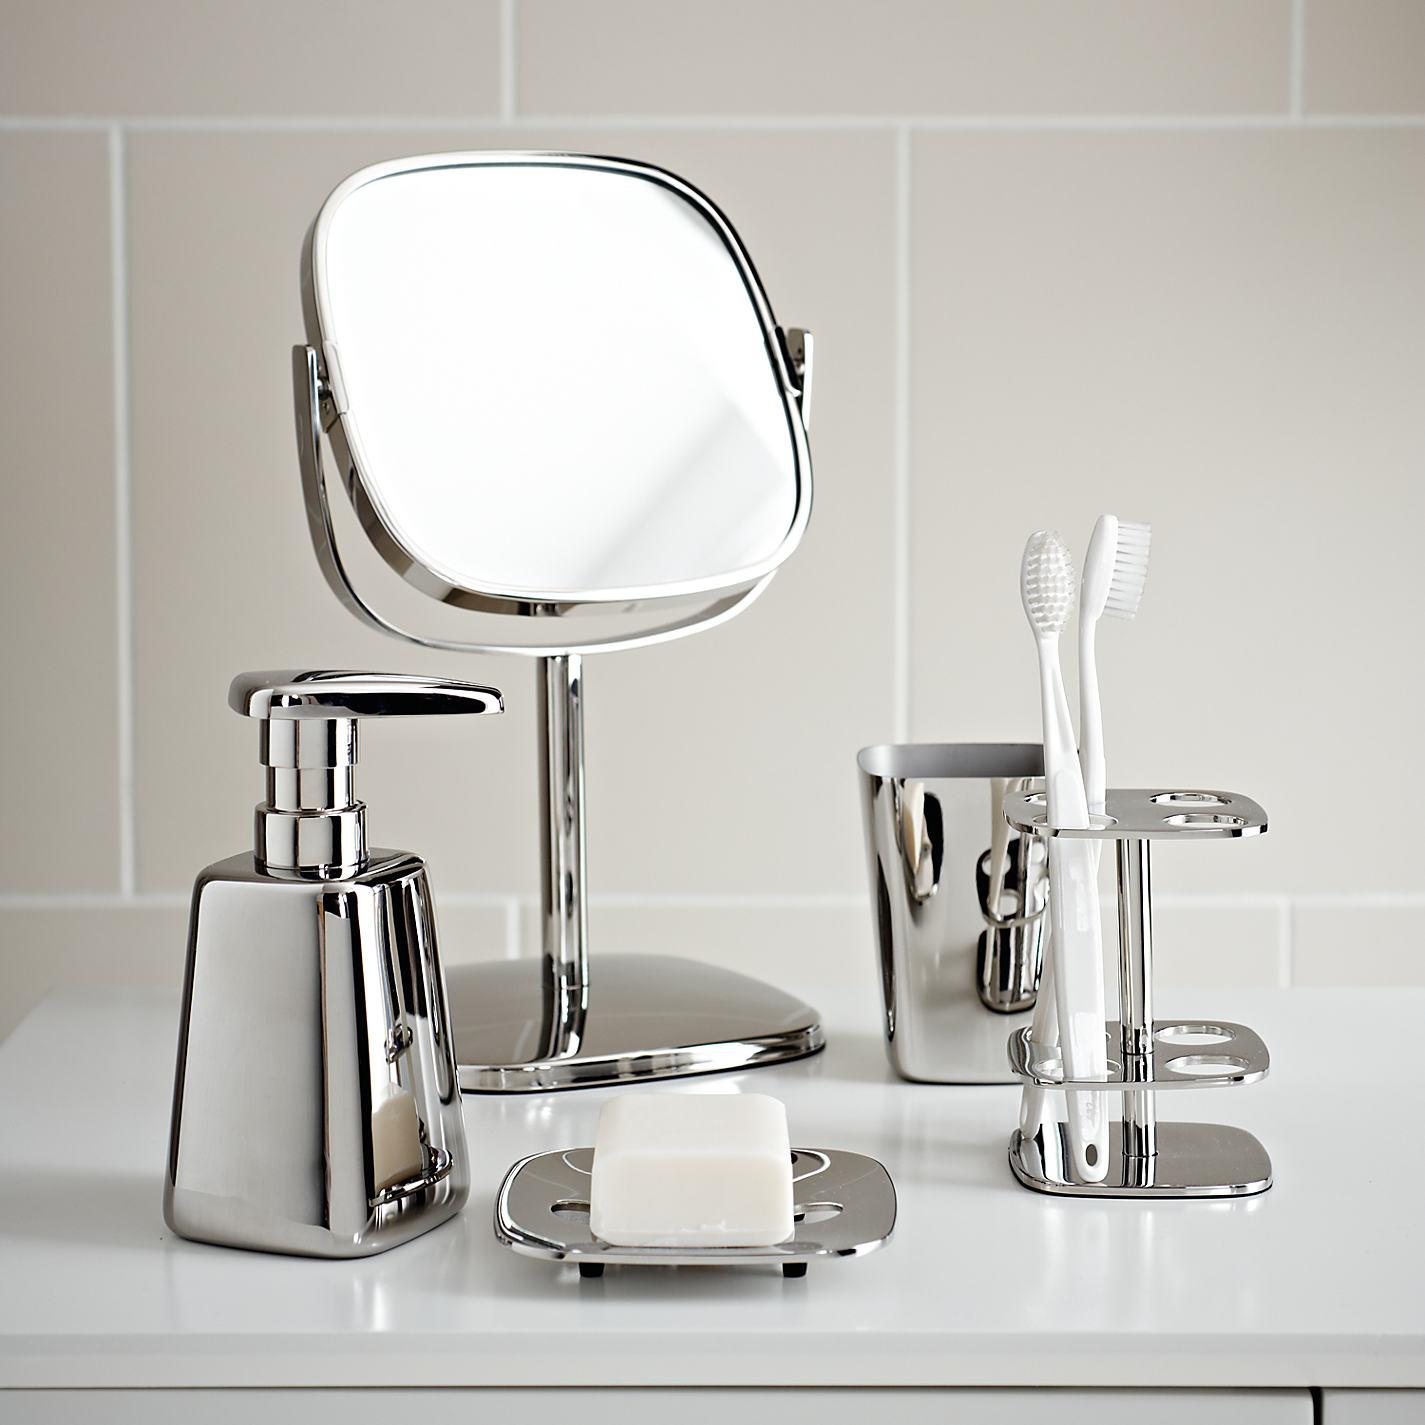 Bathroom accessories john lewis -  Buy Robert Welch Burford Toilet Roll Holder Stainless Steel Online At Johnlewis Com